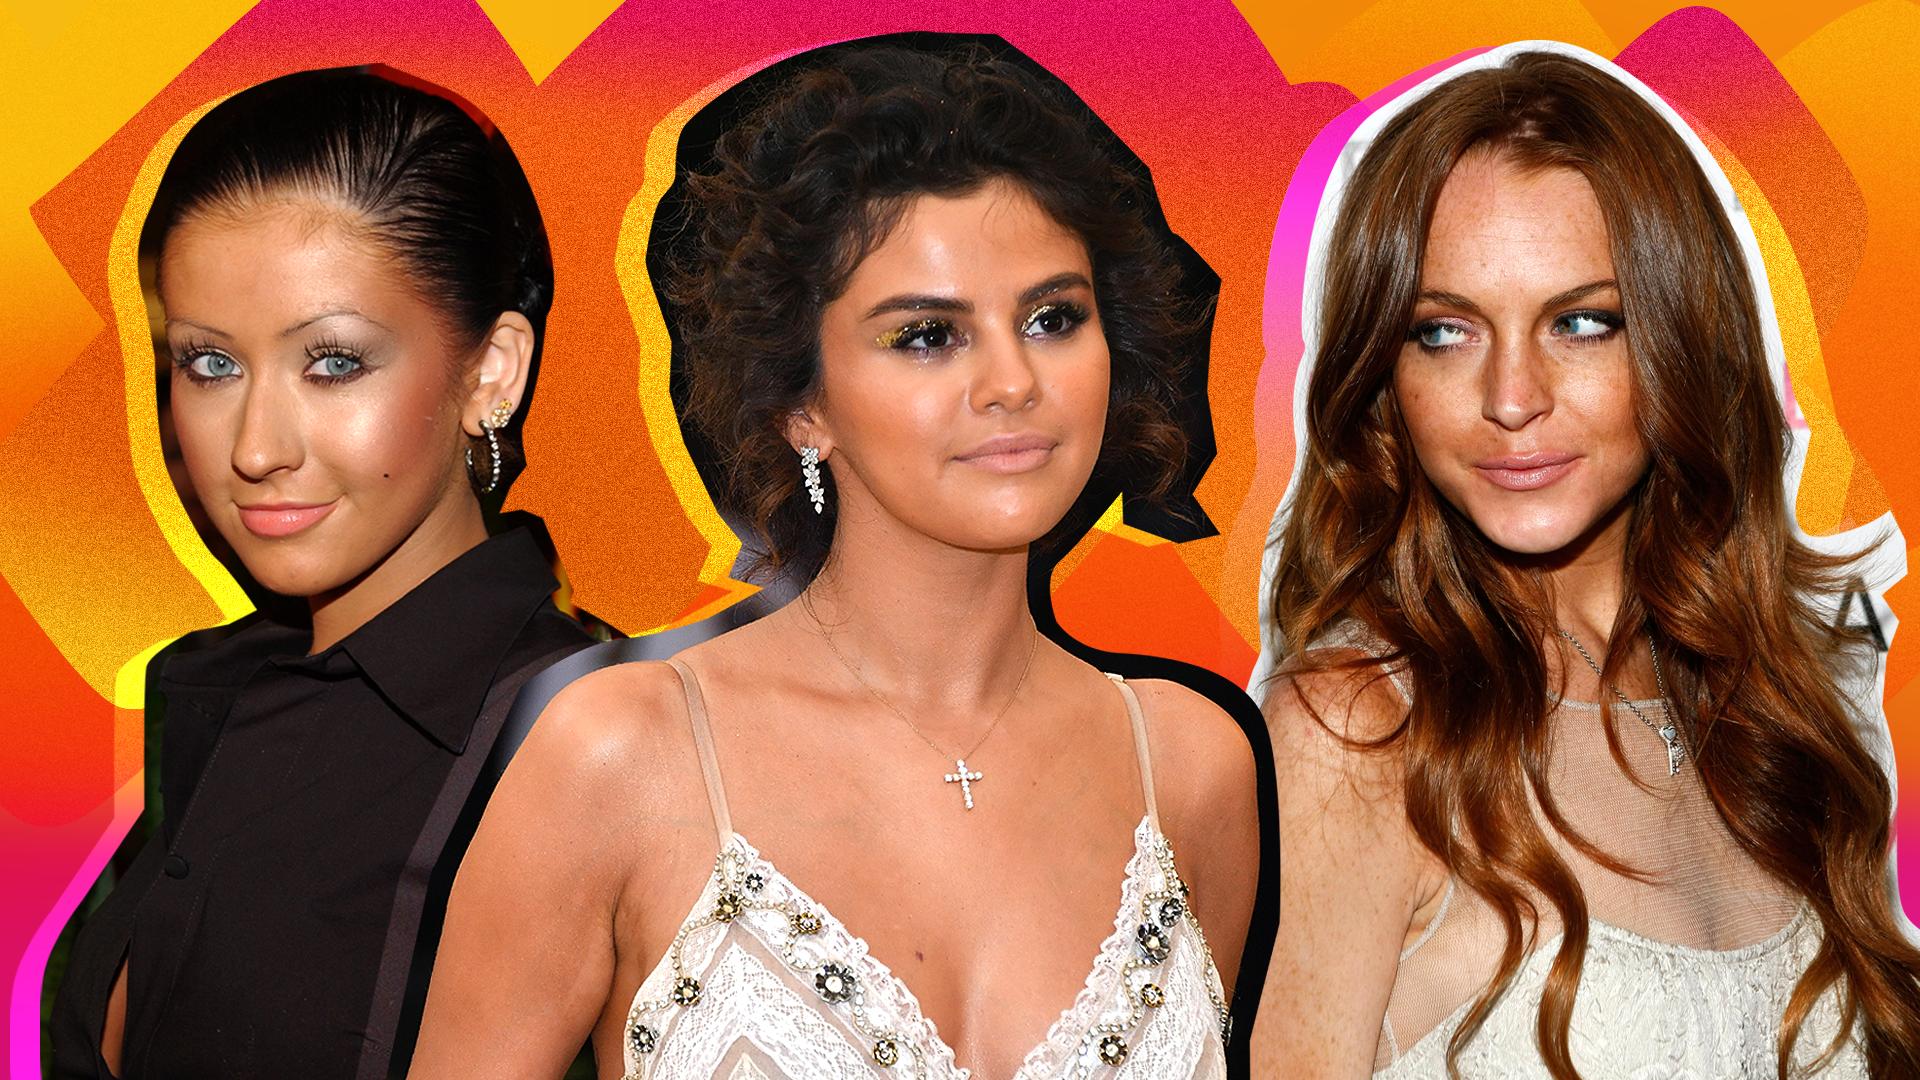 Selena Gomez, Christina Aguilera, Lindsay Lohan